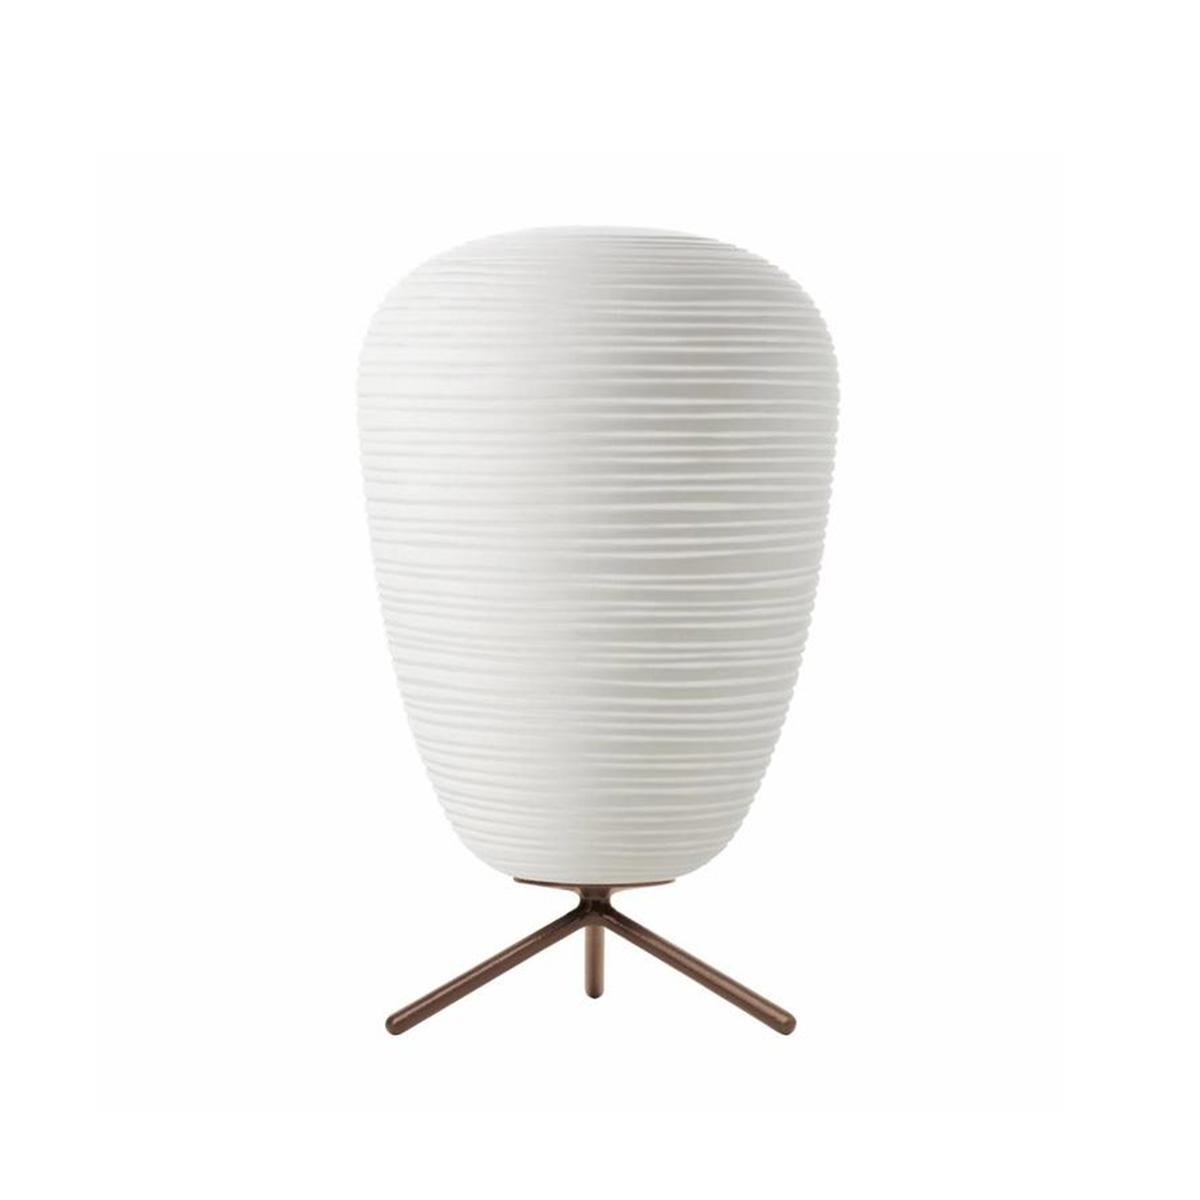 Stona lampa RITUALS 1 -  2440011 10